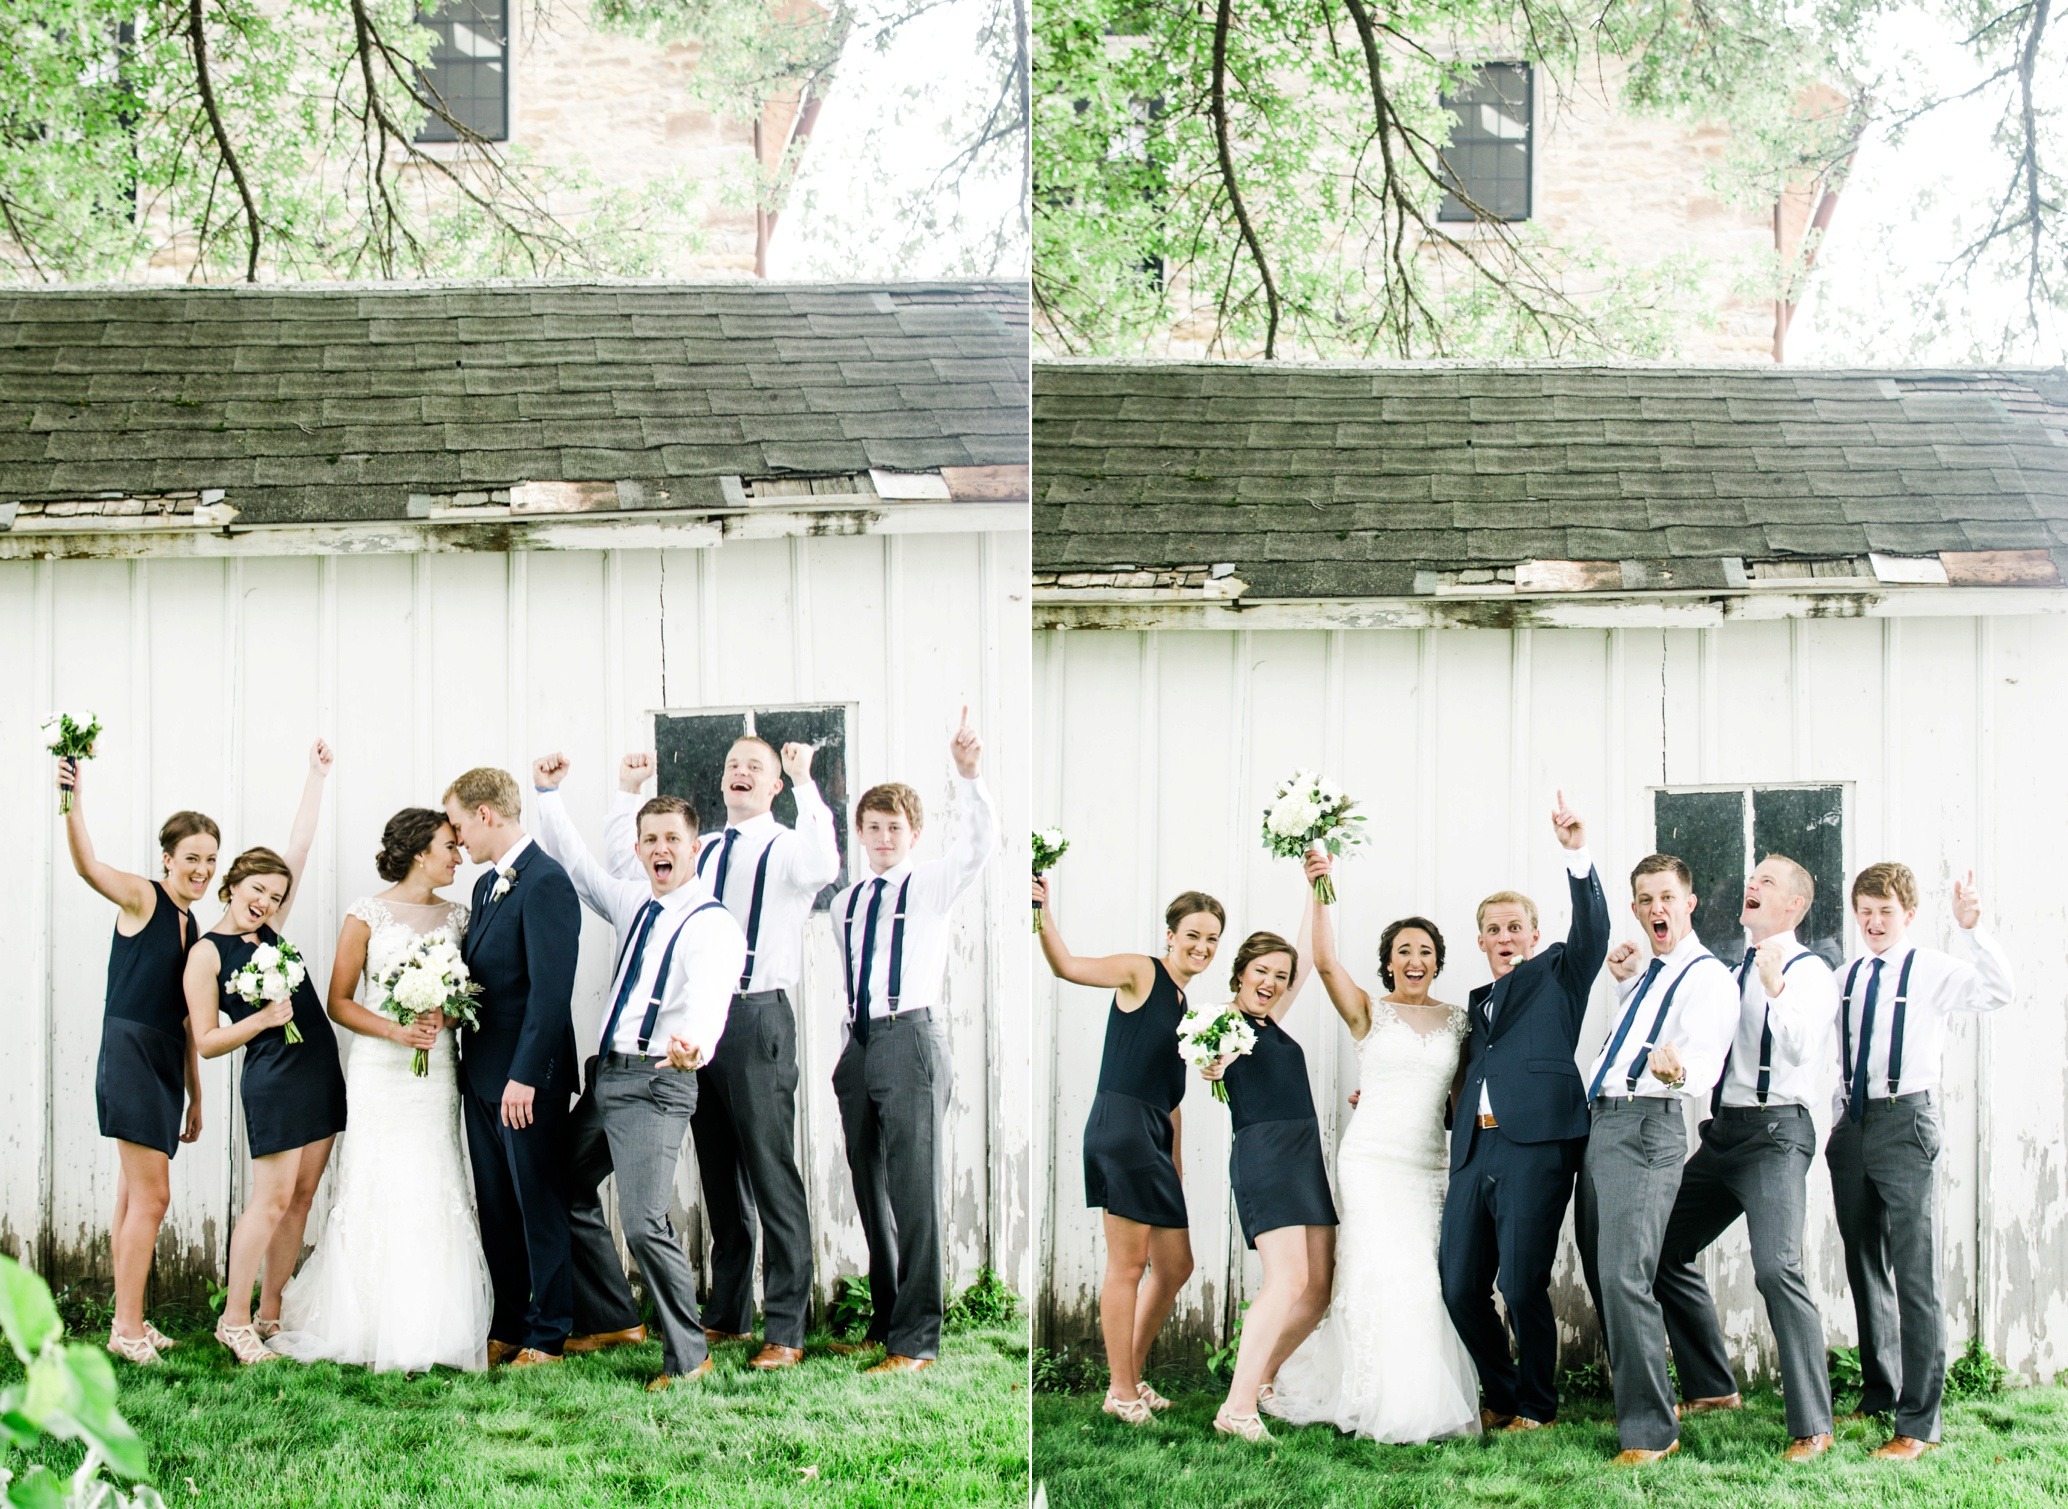 Palmer House and Stable Solon, IA | Ali Leigh Photo Minneapolis Wedding Photographer_0254.jpg